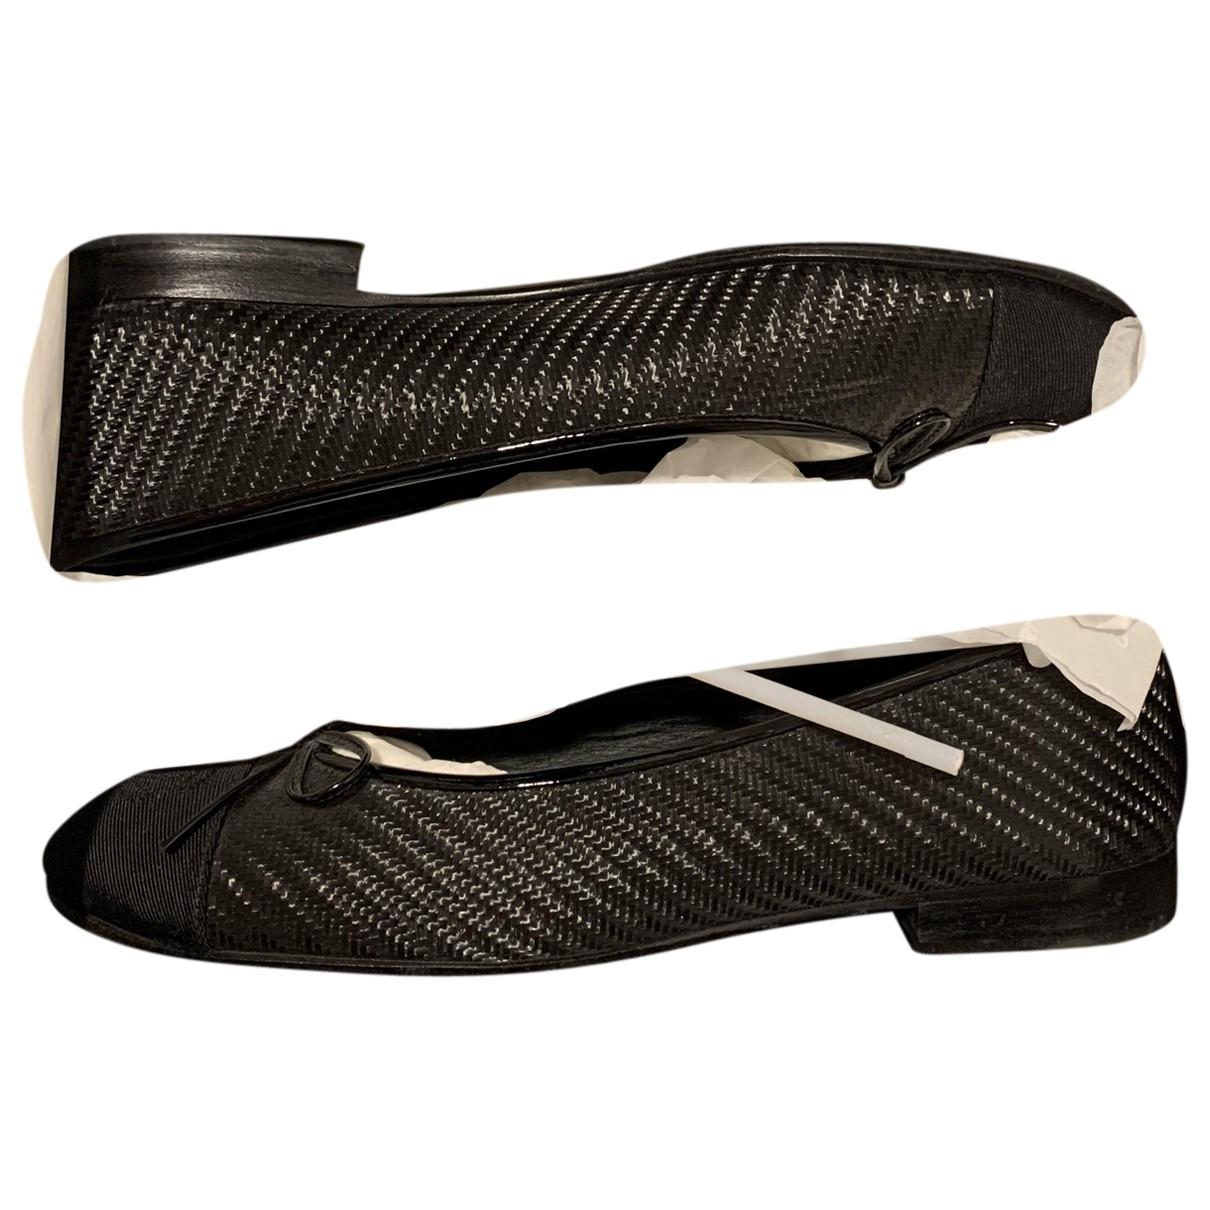 Chanel \N Black Leather Ballet flats for Women 38.5 EU